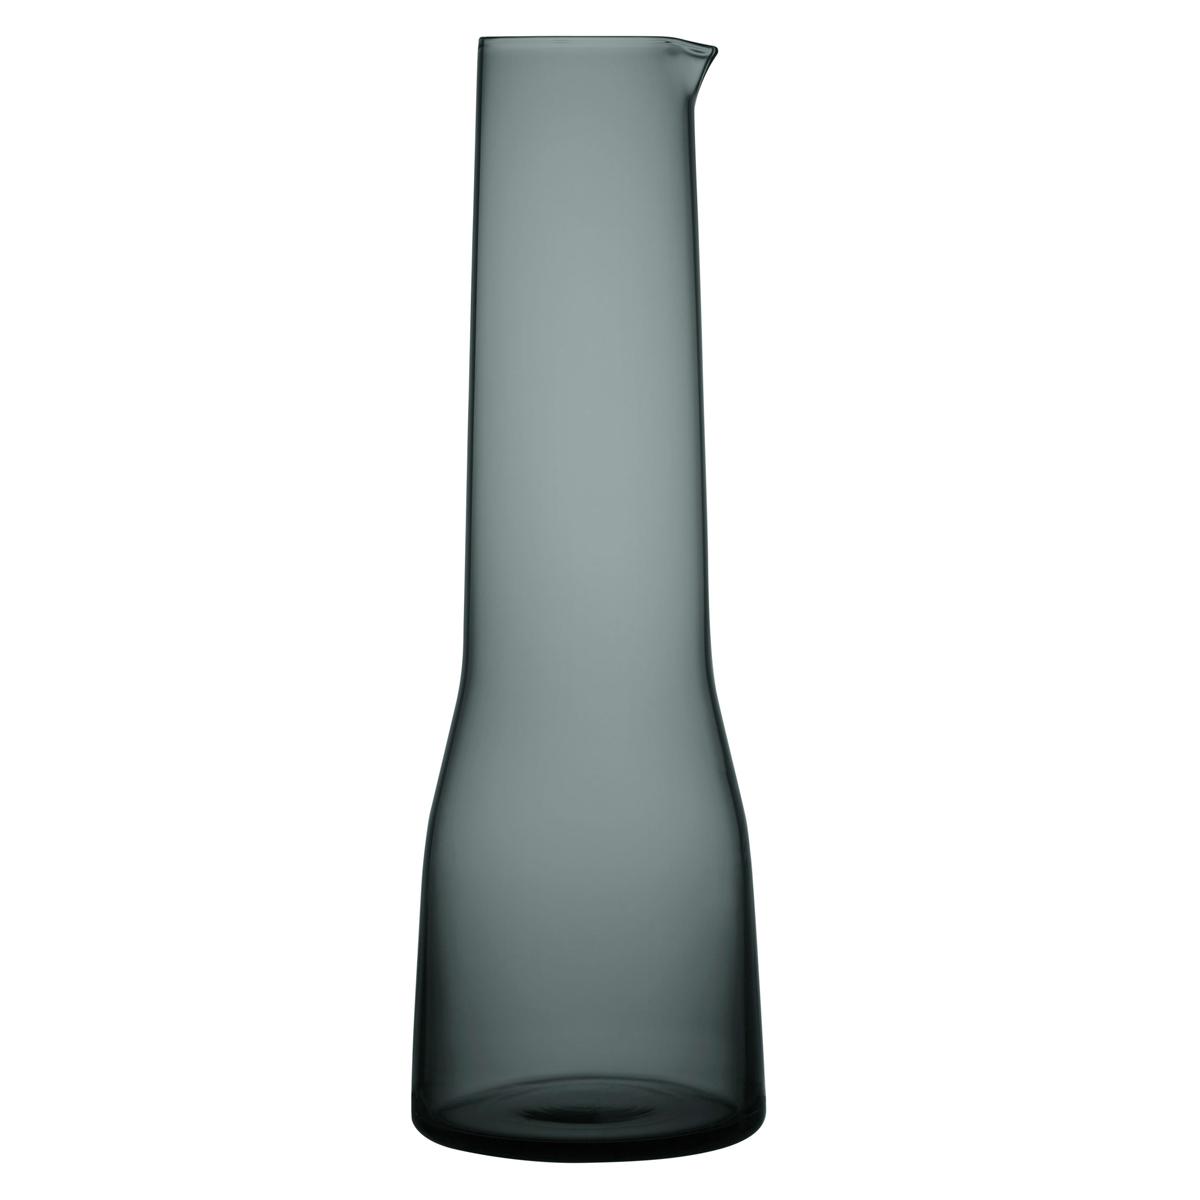 Iittala Essence Decanter 1.2 Qt Dark Grey